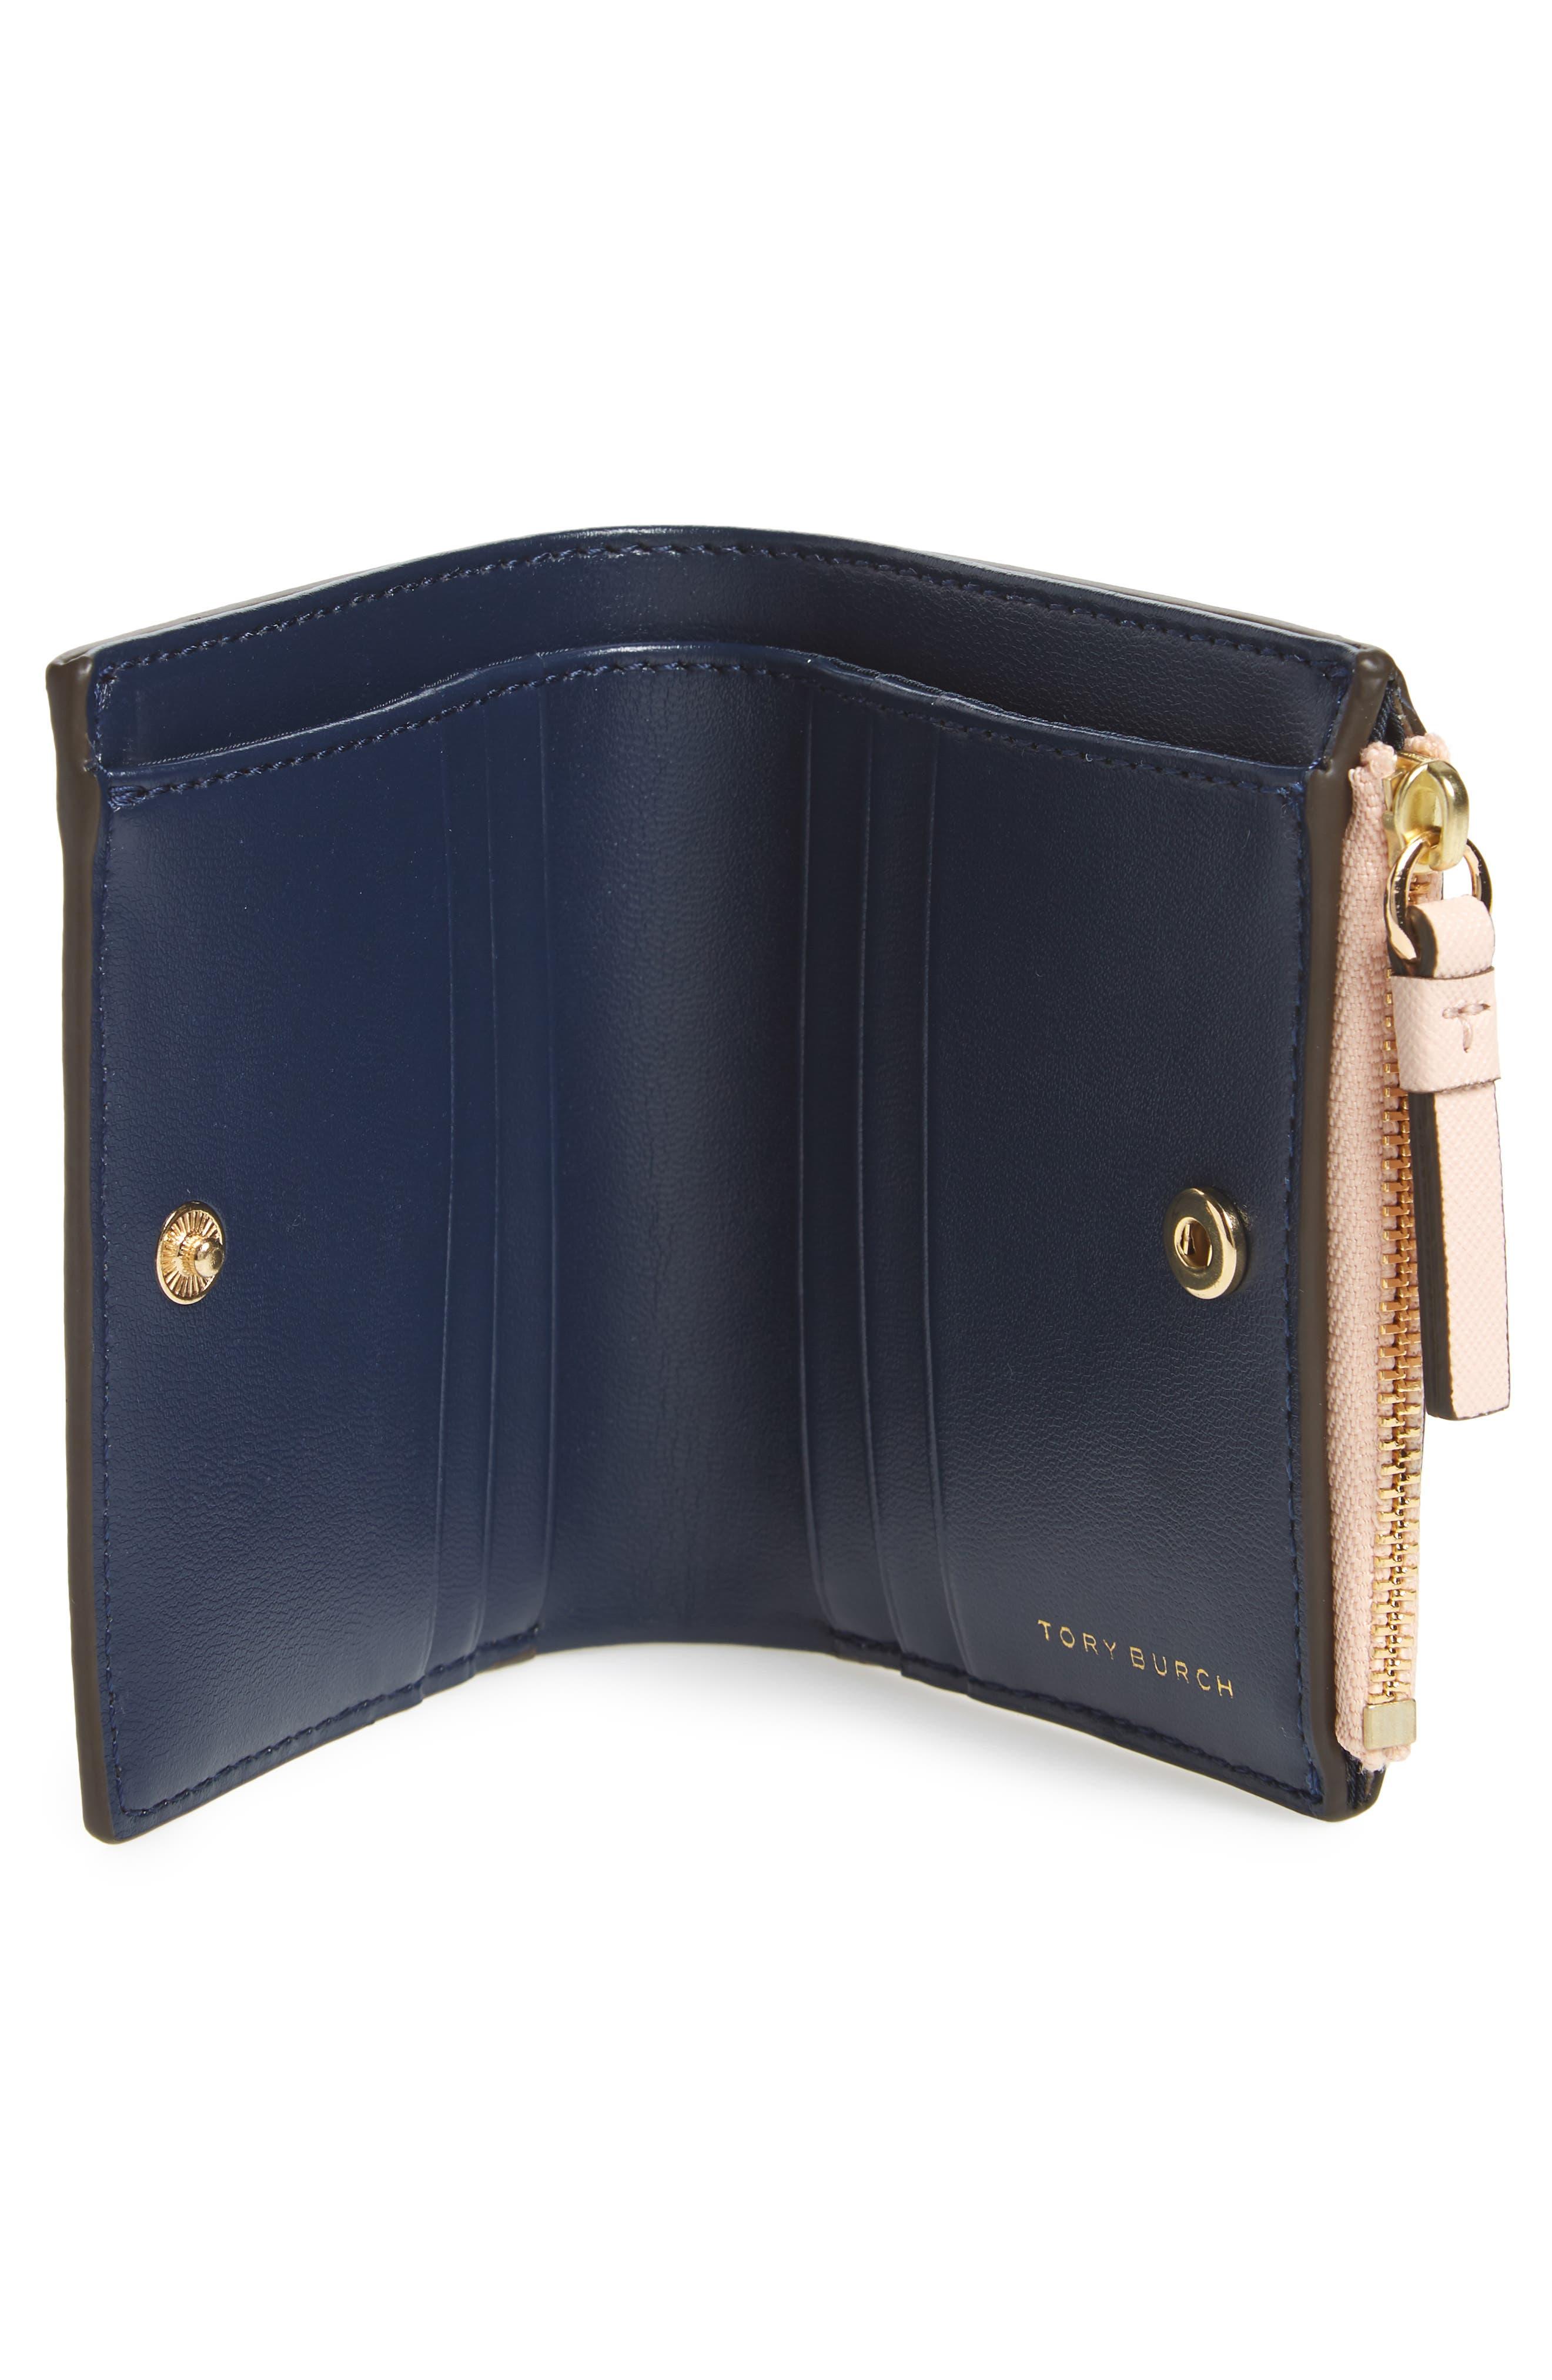 Mini Robinson Wallet Leather Bifold Wallet,                             Alternate thumbnail 2, color,                             Pale Apricot / Royal Navy